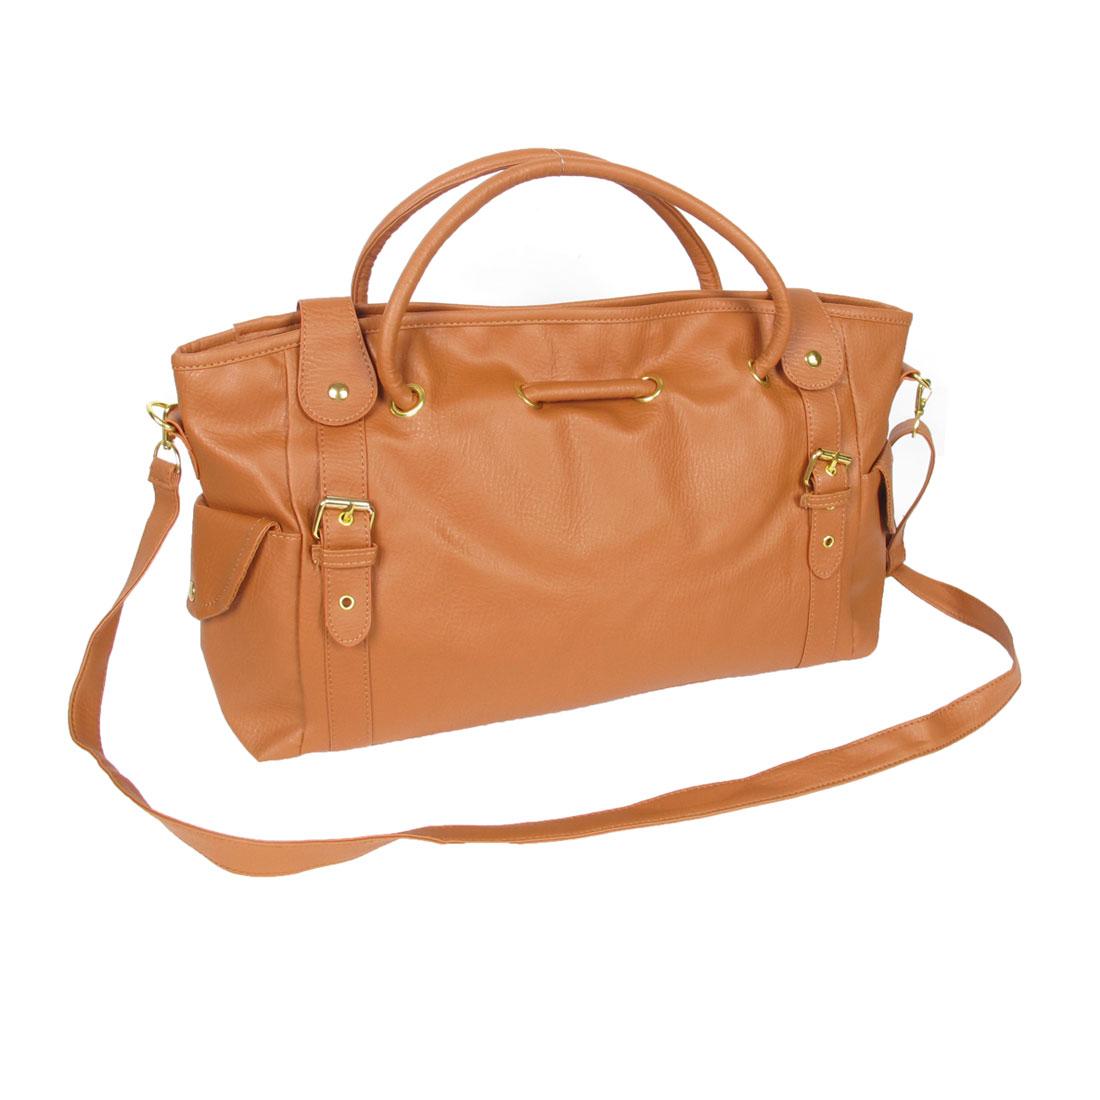 Women Magnetic Flap Closure Adjustable Belt Brown Faux Leather Bag Handbag